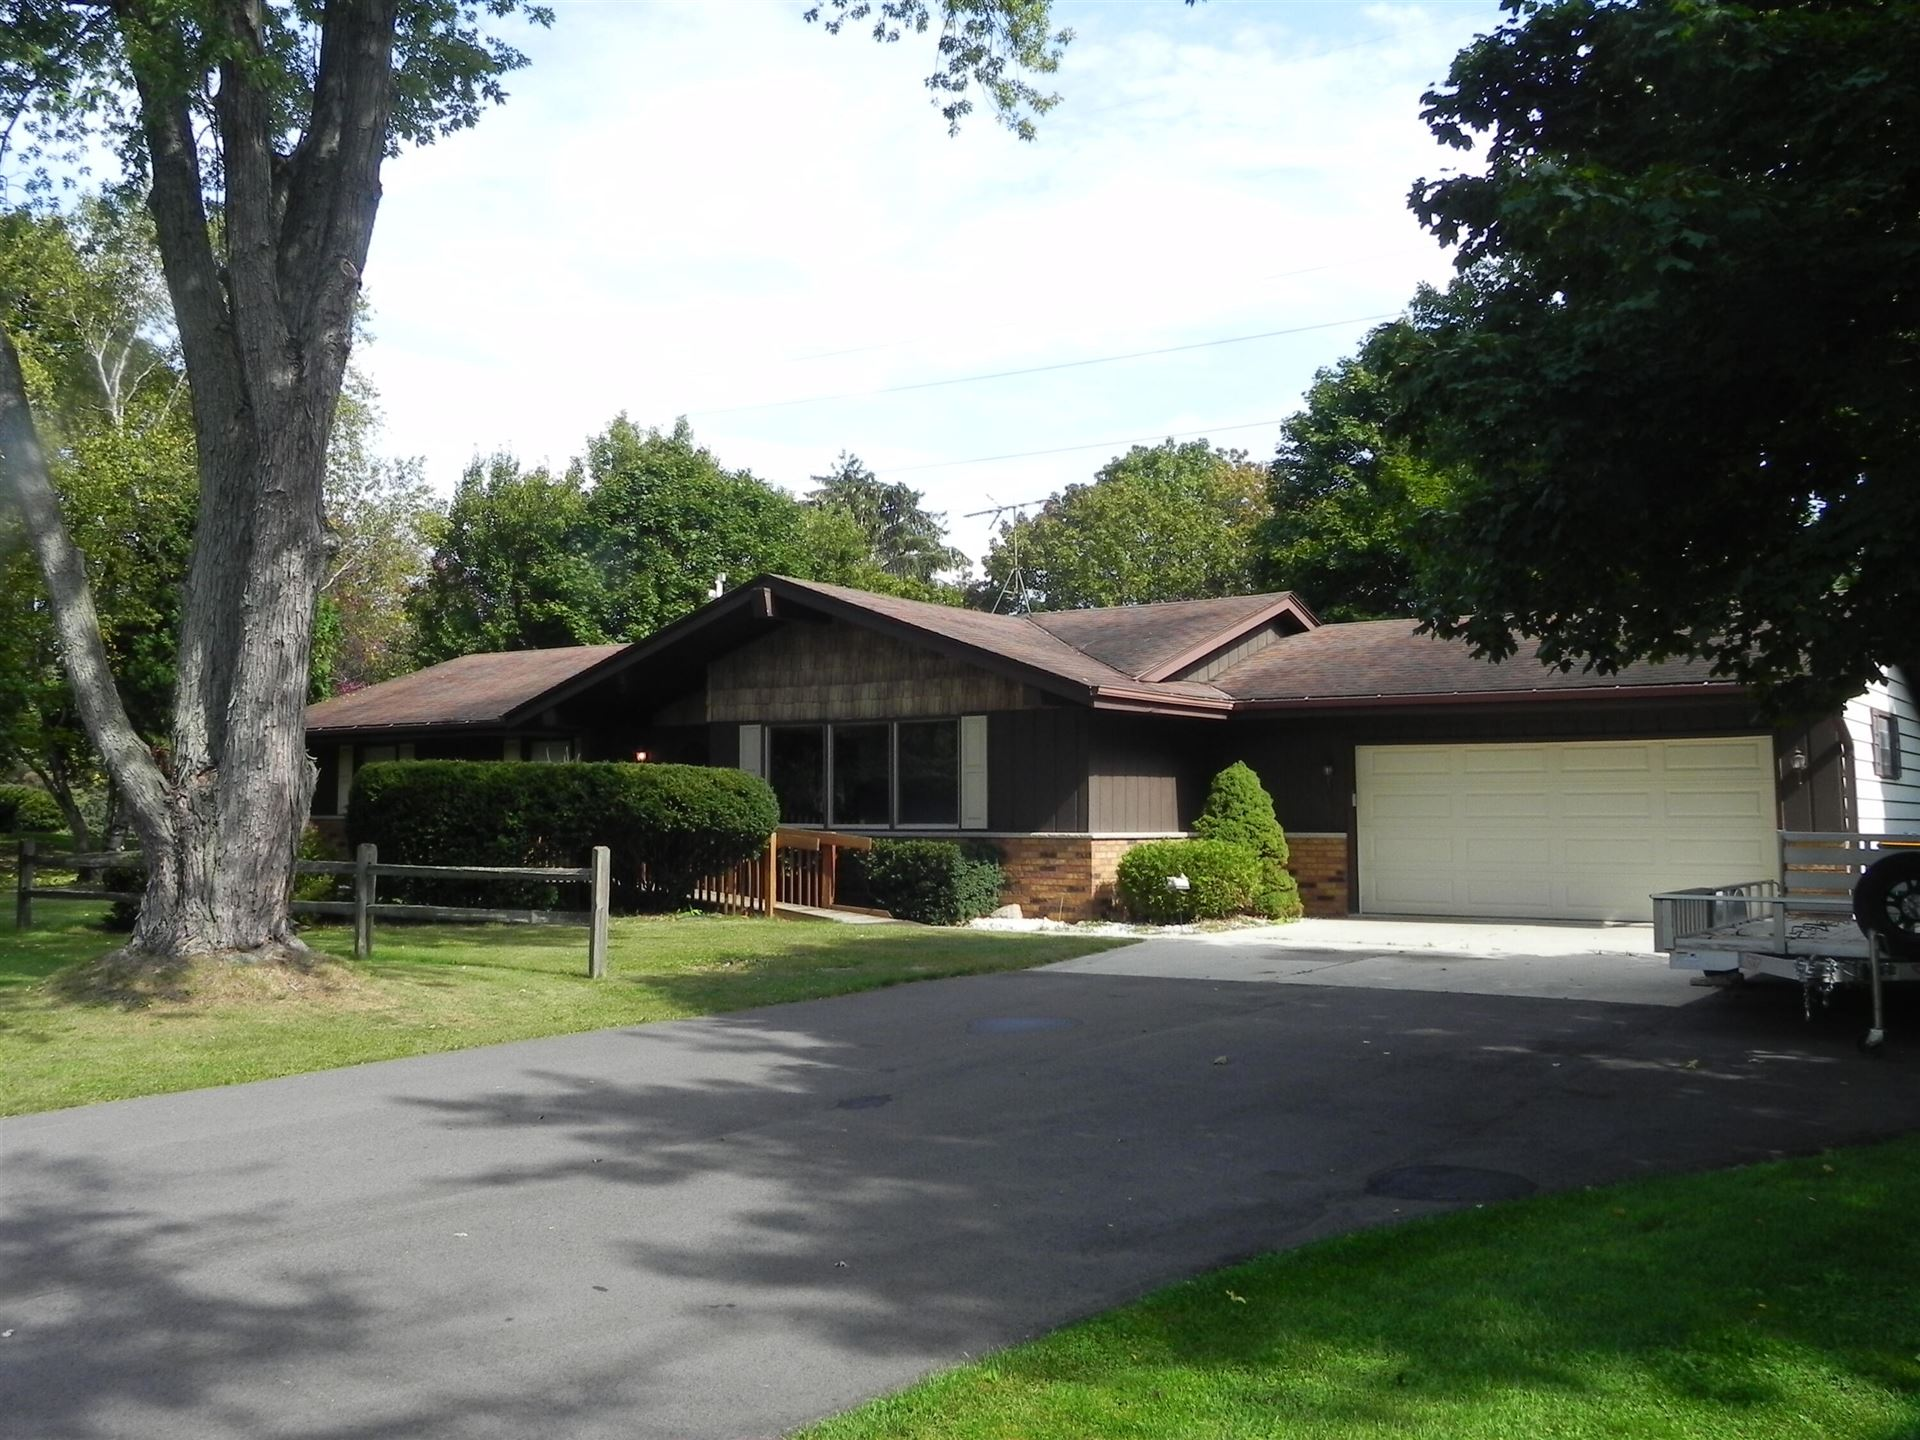 340 Stonefield Dr, Cedarburg, WI 53012 - #: 1766299